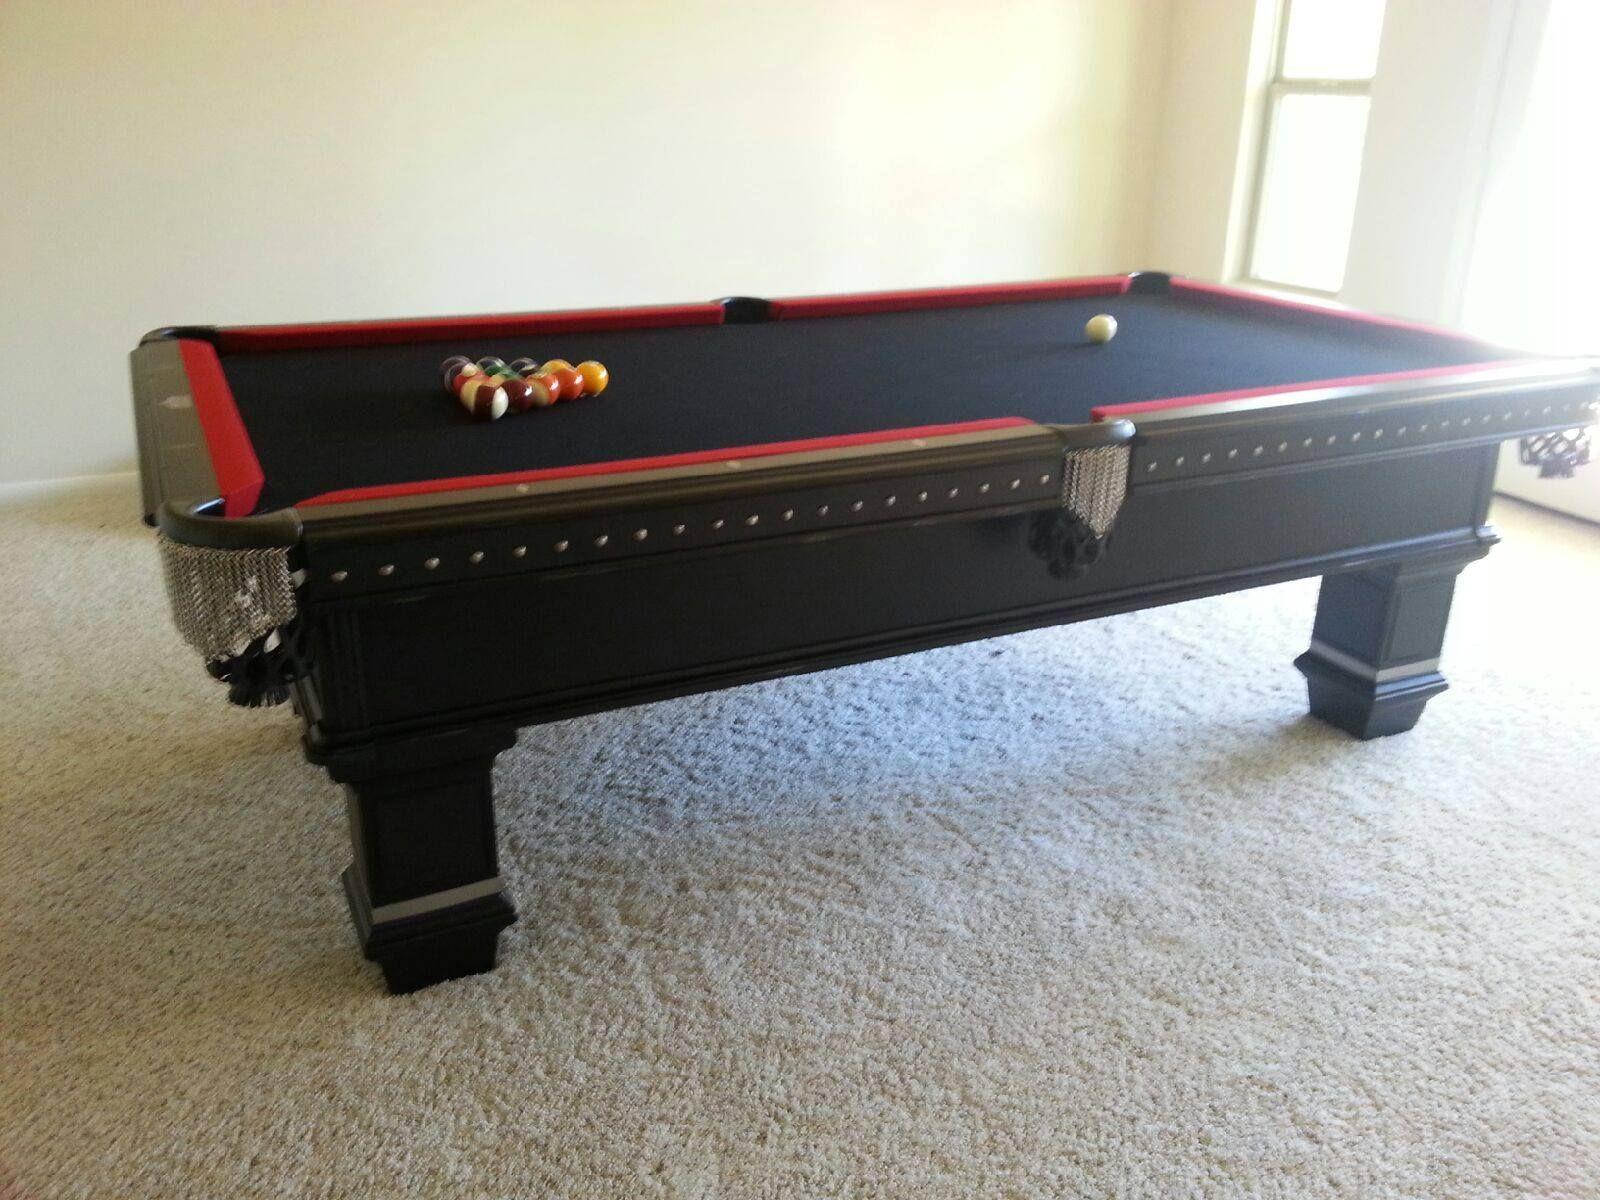 This Legacy Billiards Reaper Pool Table Looks Awesome In Mary Ls - Legacy billiards table